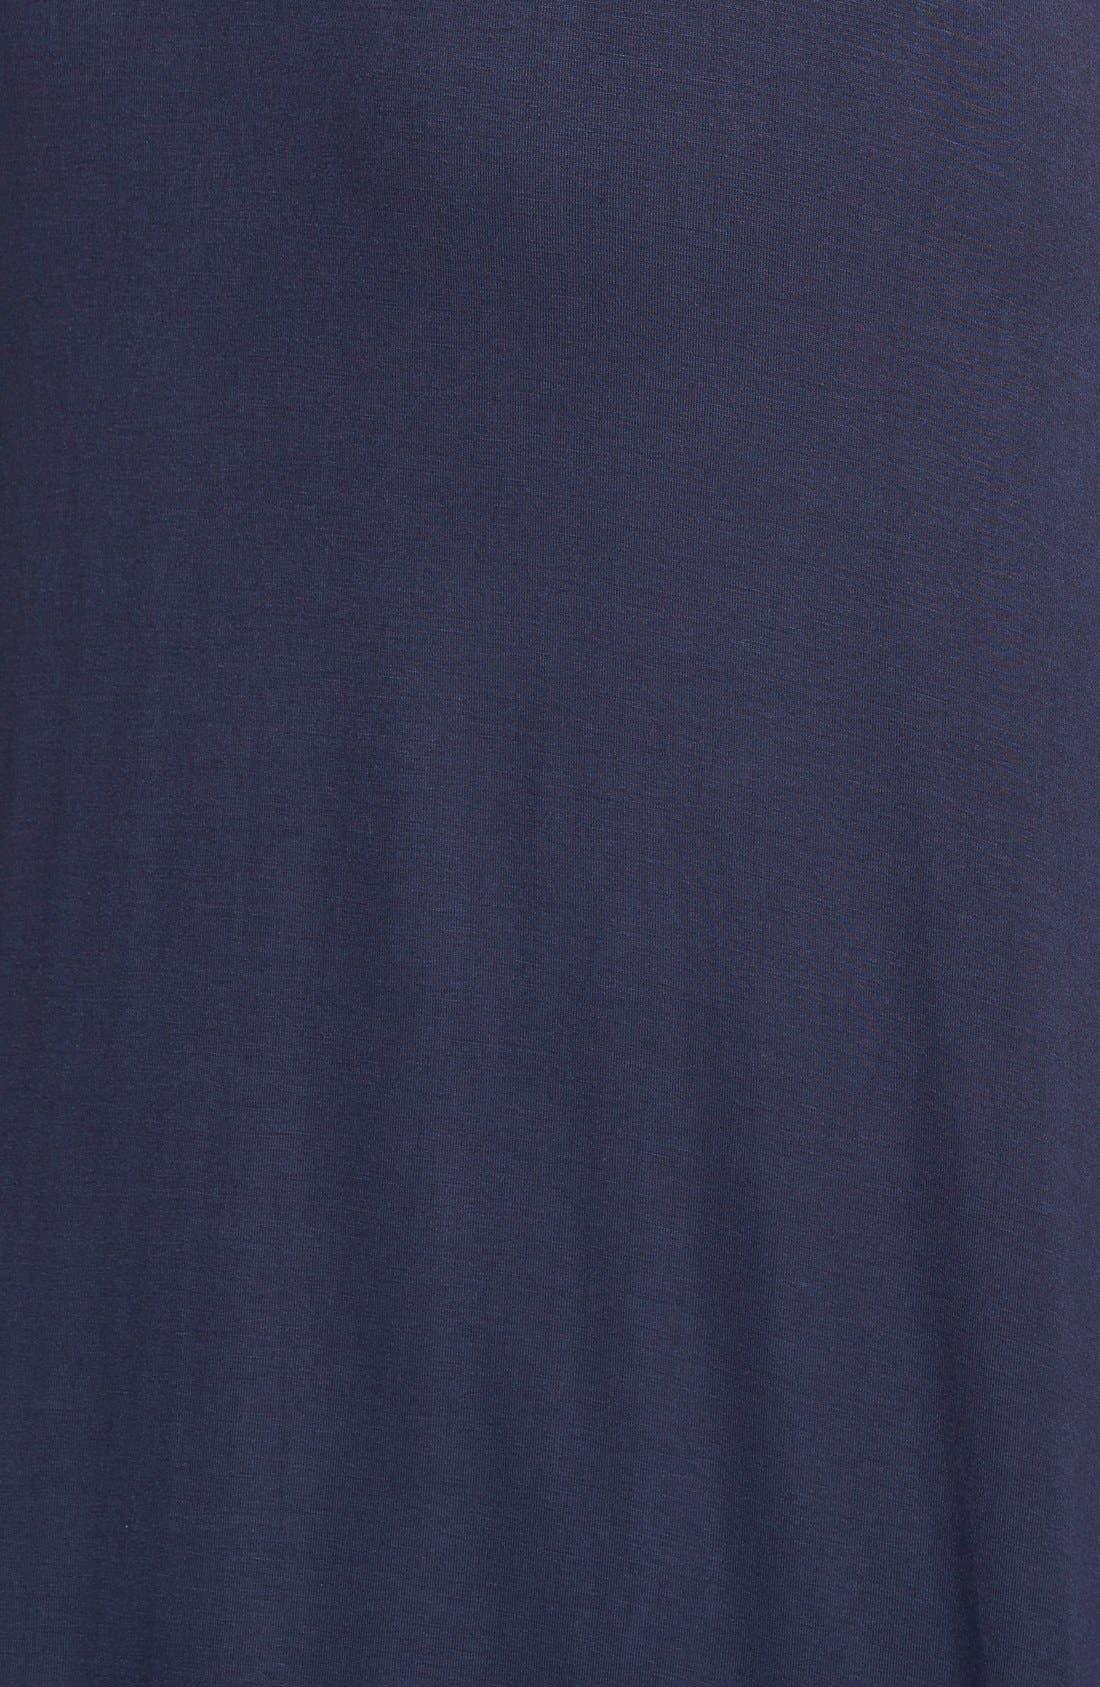 Alternate Image 3  - Loveappella Maxi Dress (Regular & Petite)